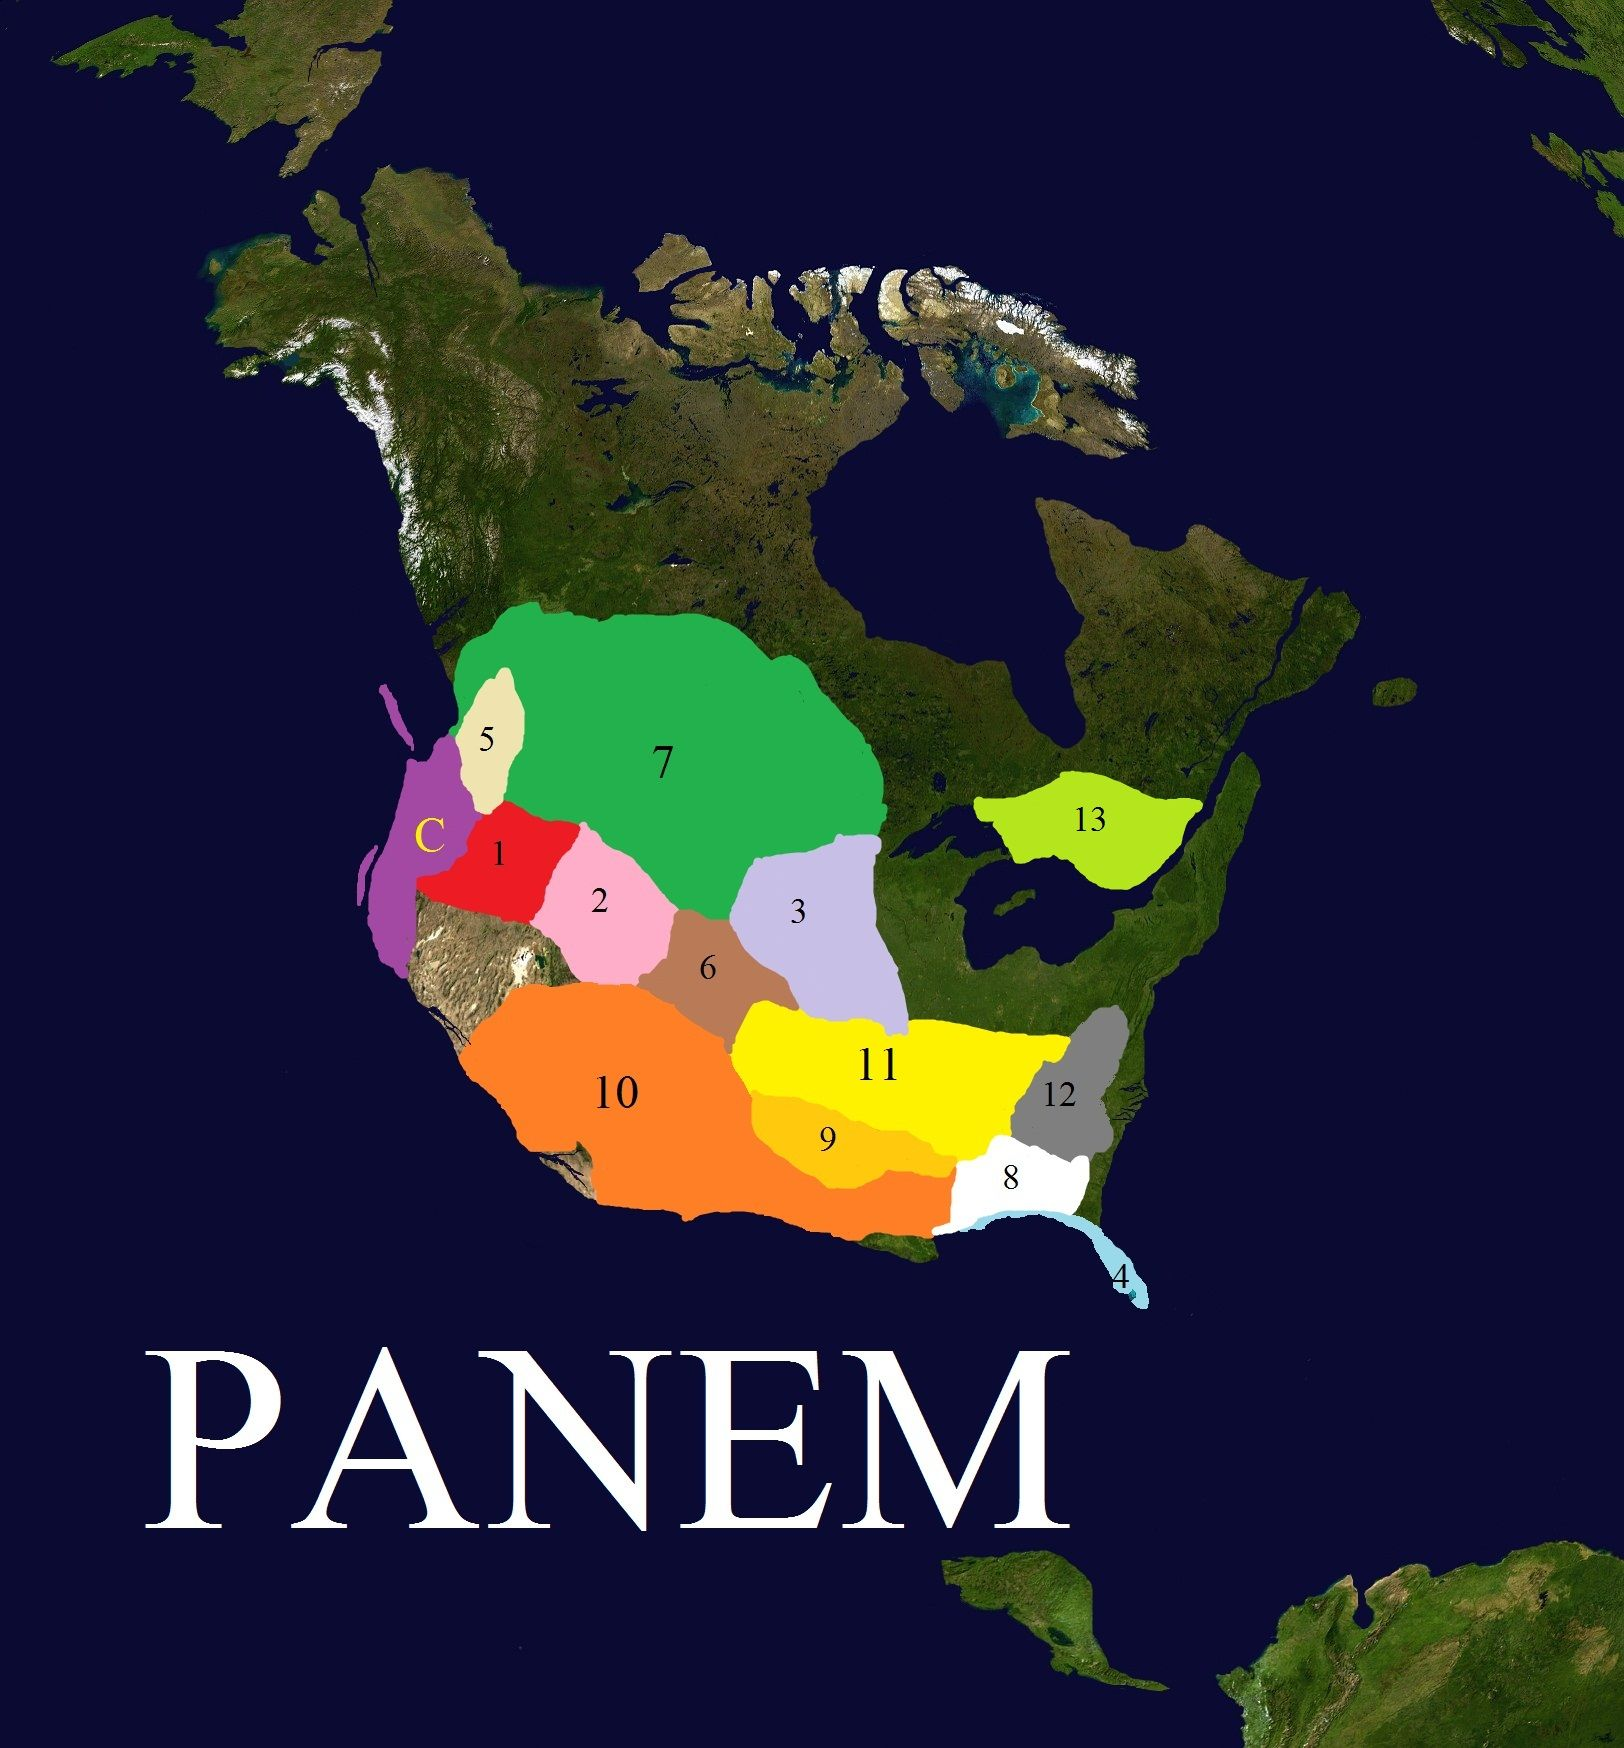 list of panem districts